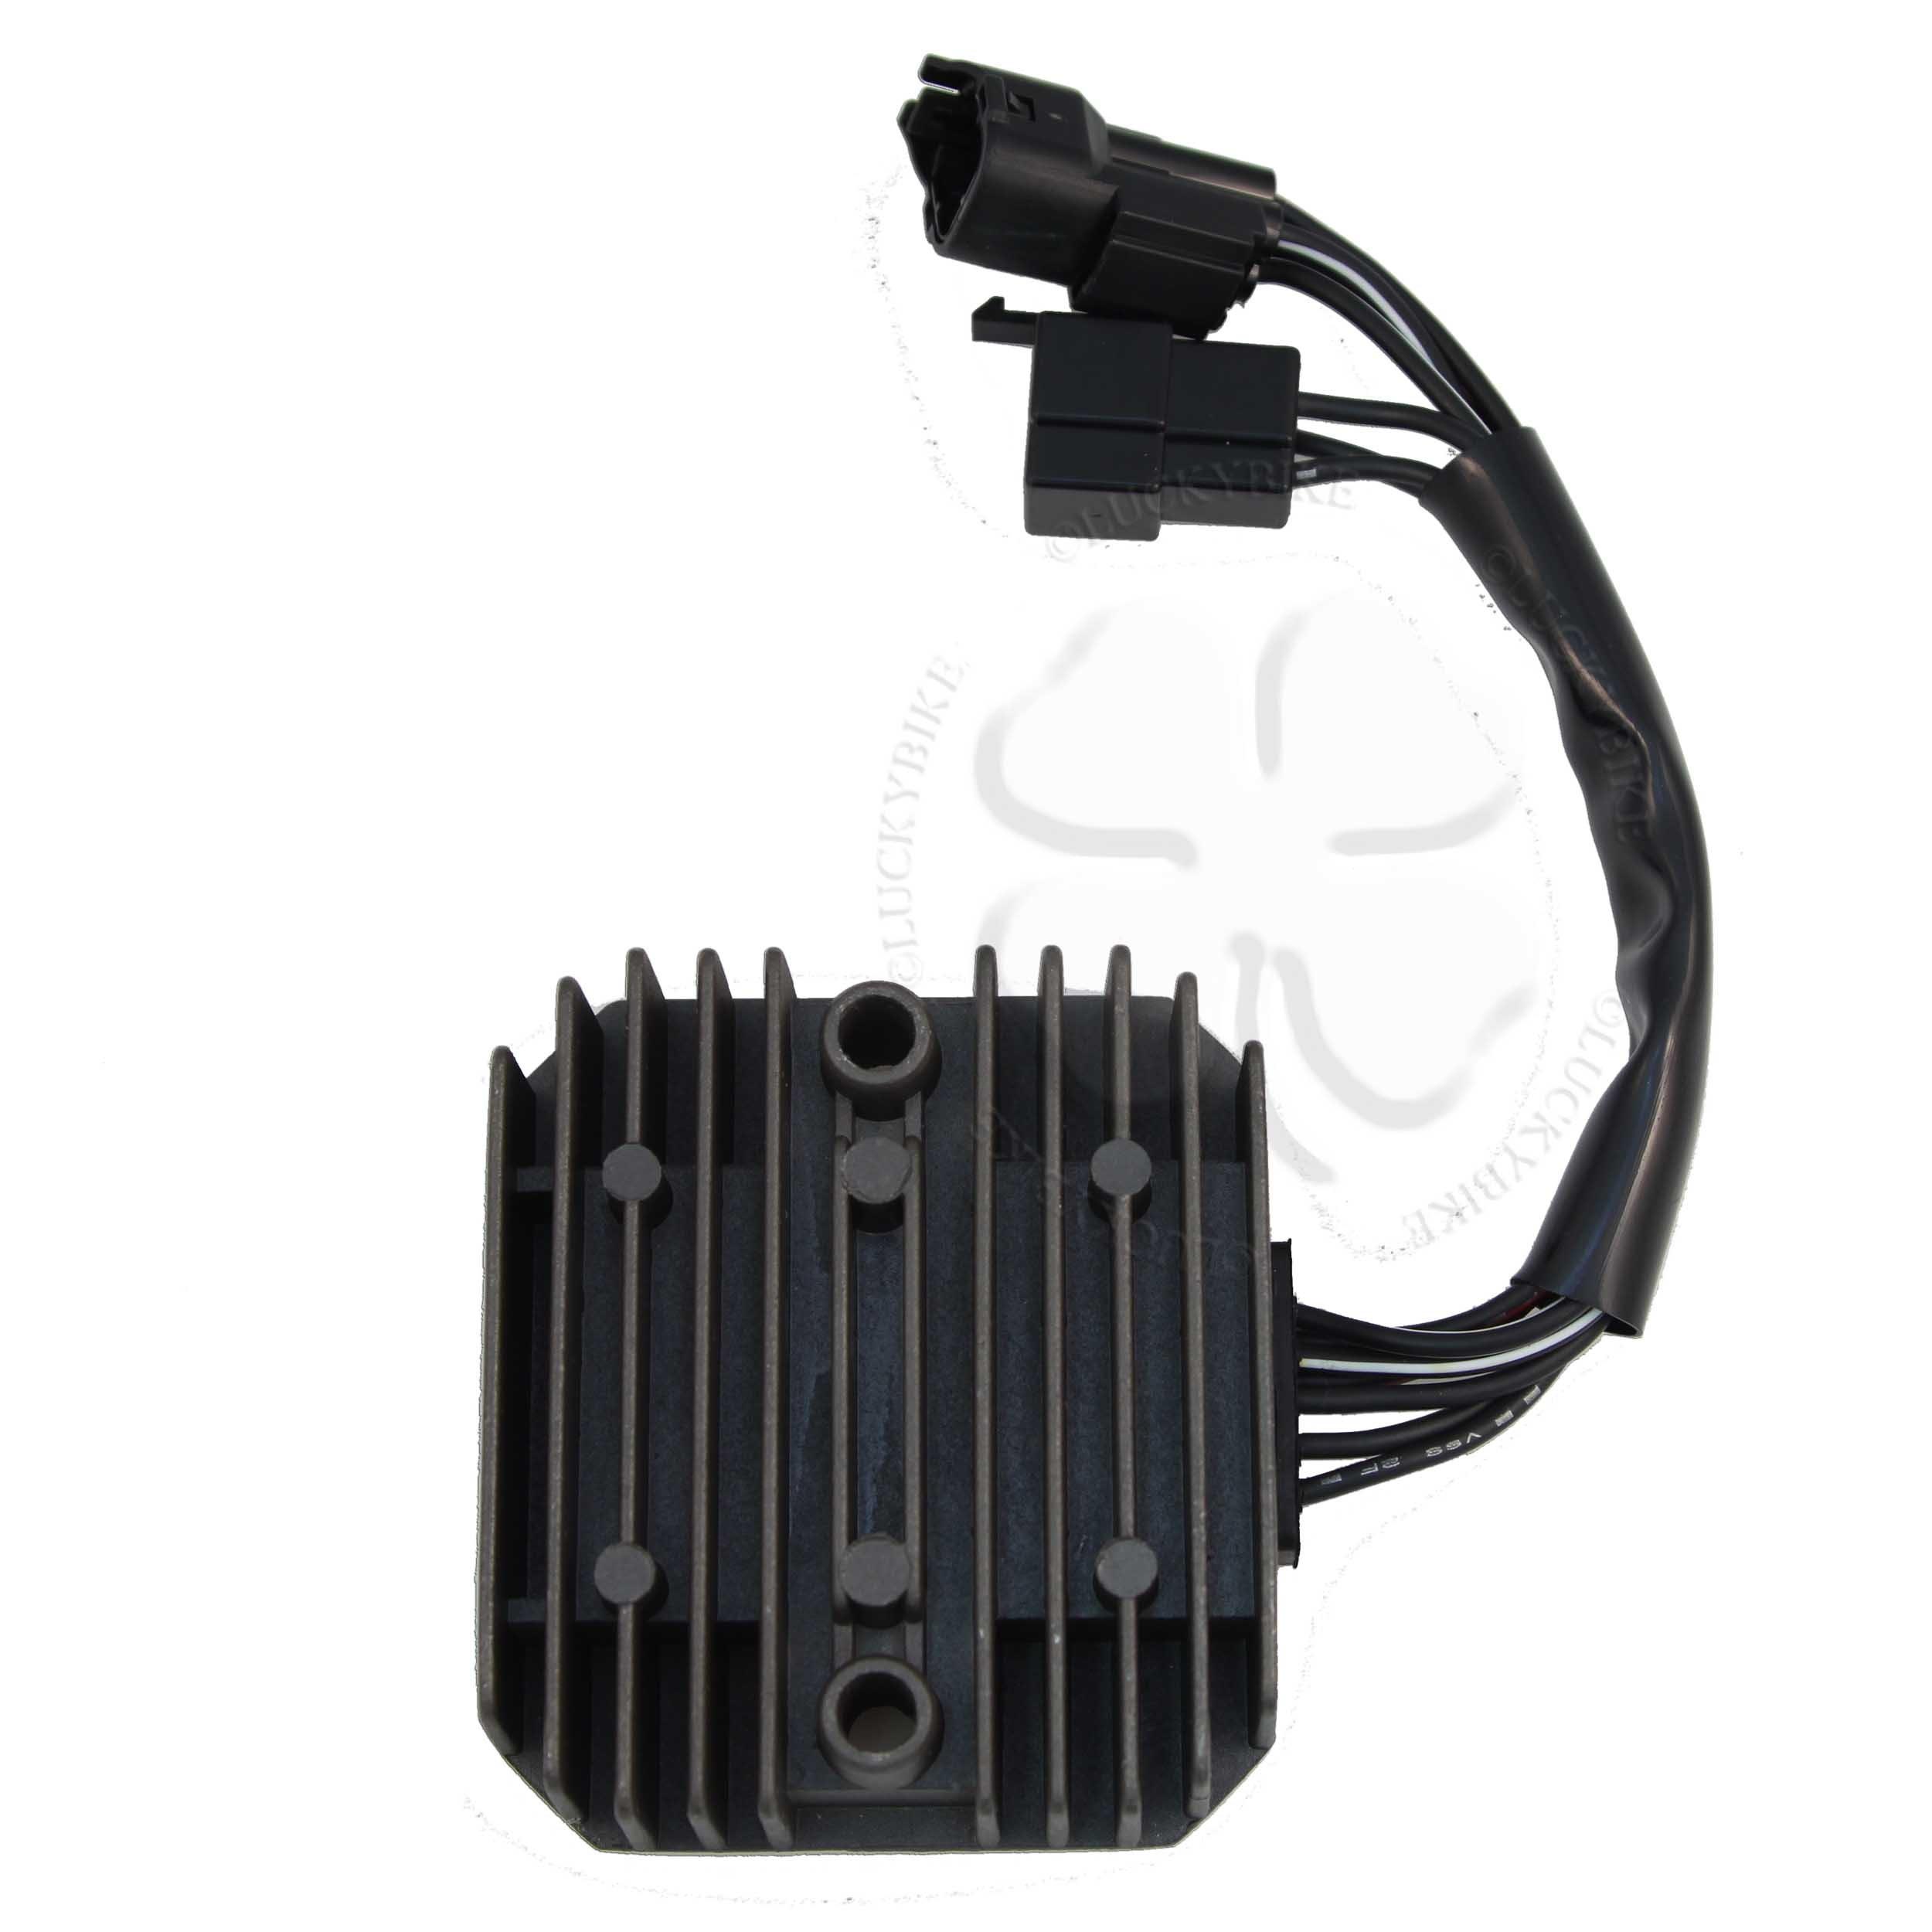 Electrical - Regulator - Suzuki - 32800-16G00 - SV 650, SV 1000, DL650, DL1000